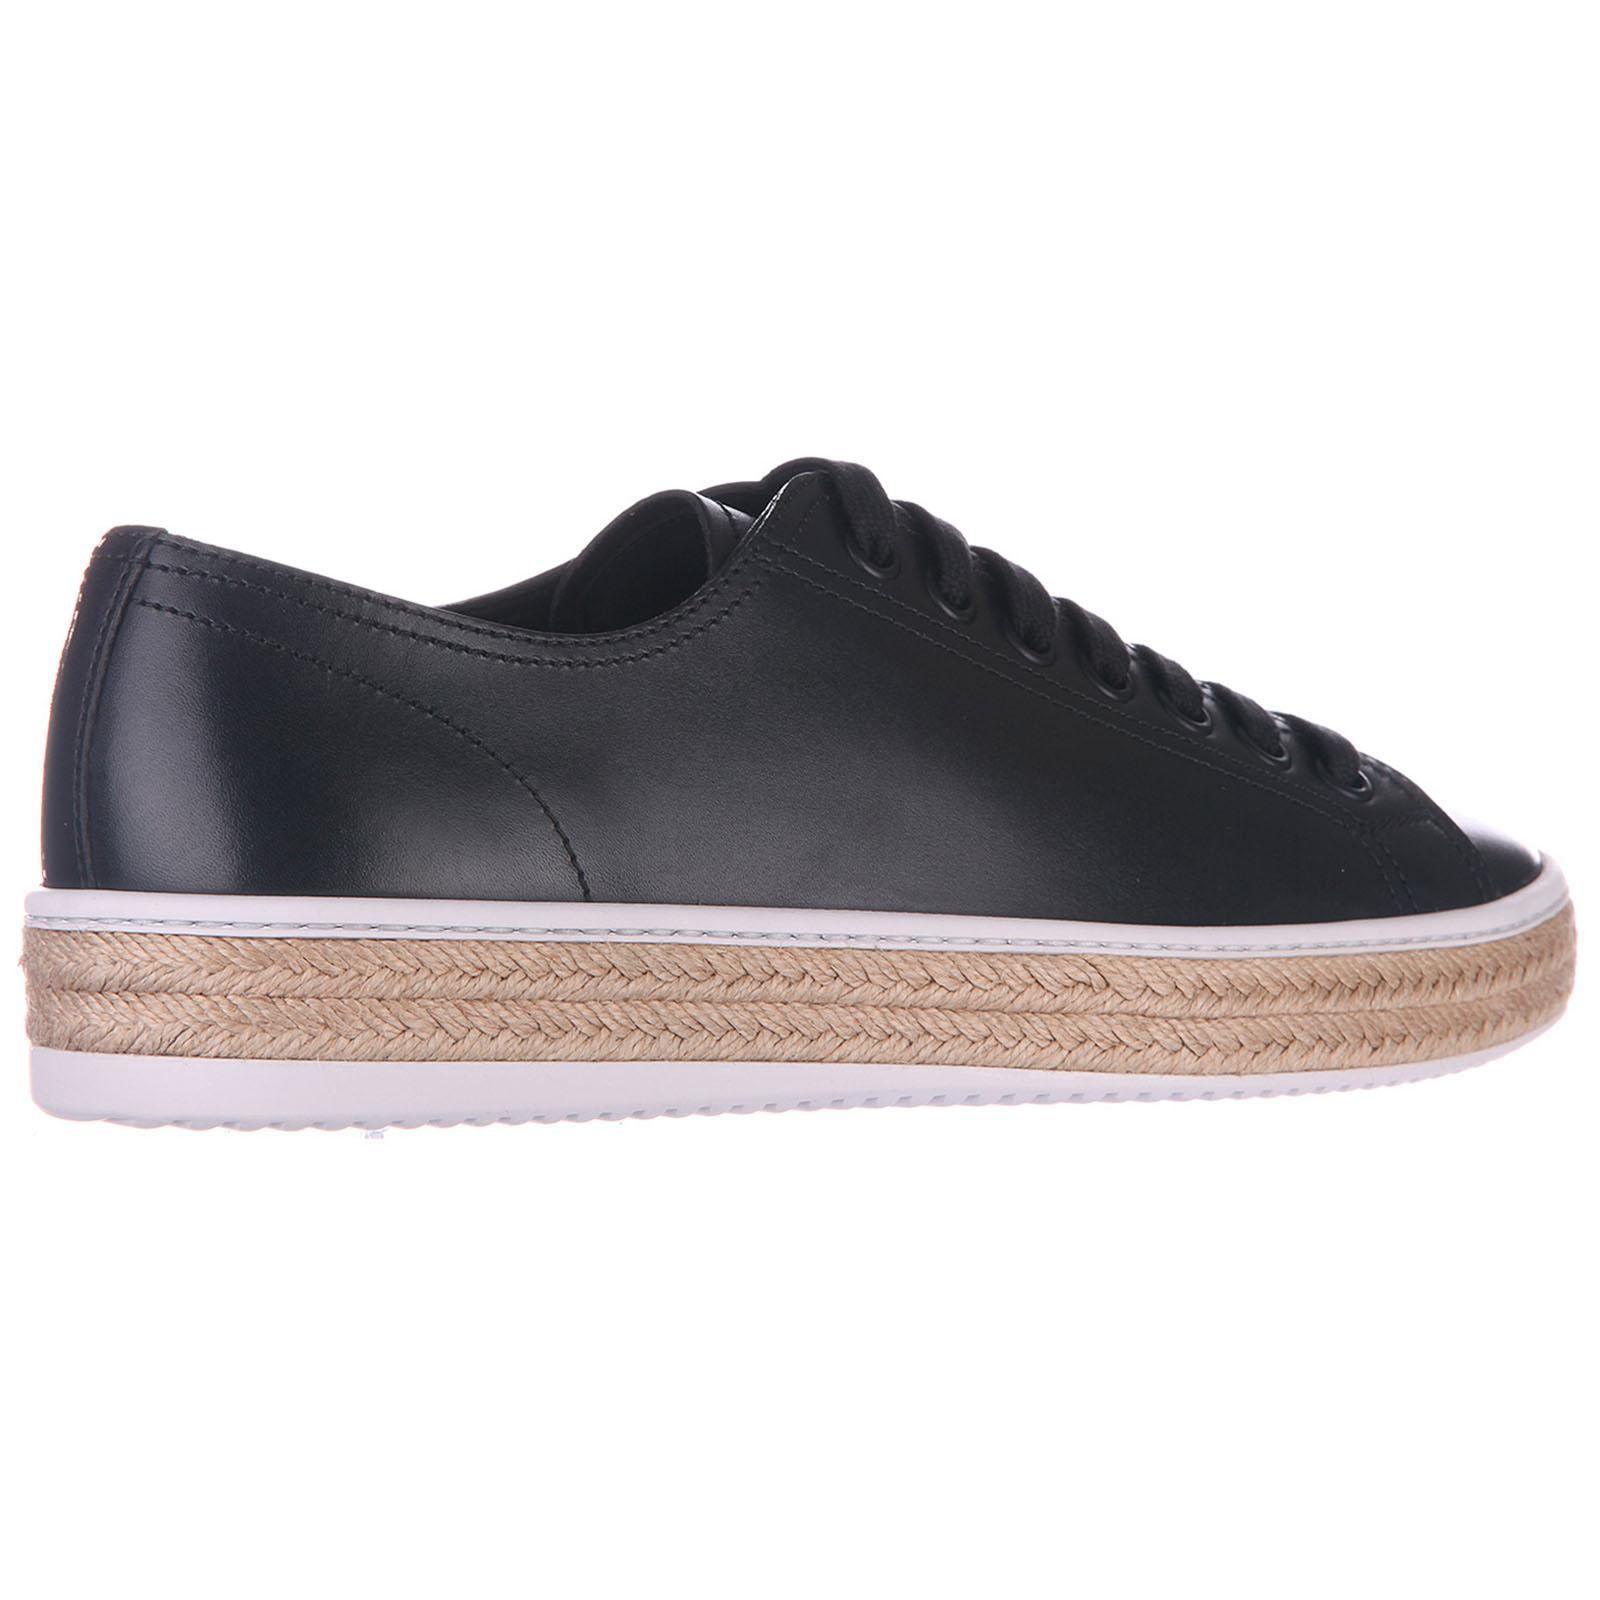 Scarpe sneakers uomo in pelle calf